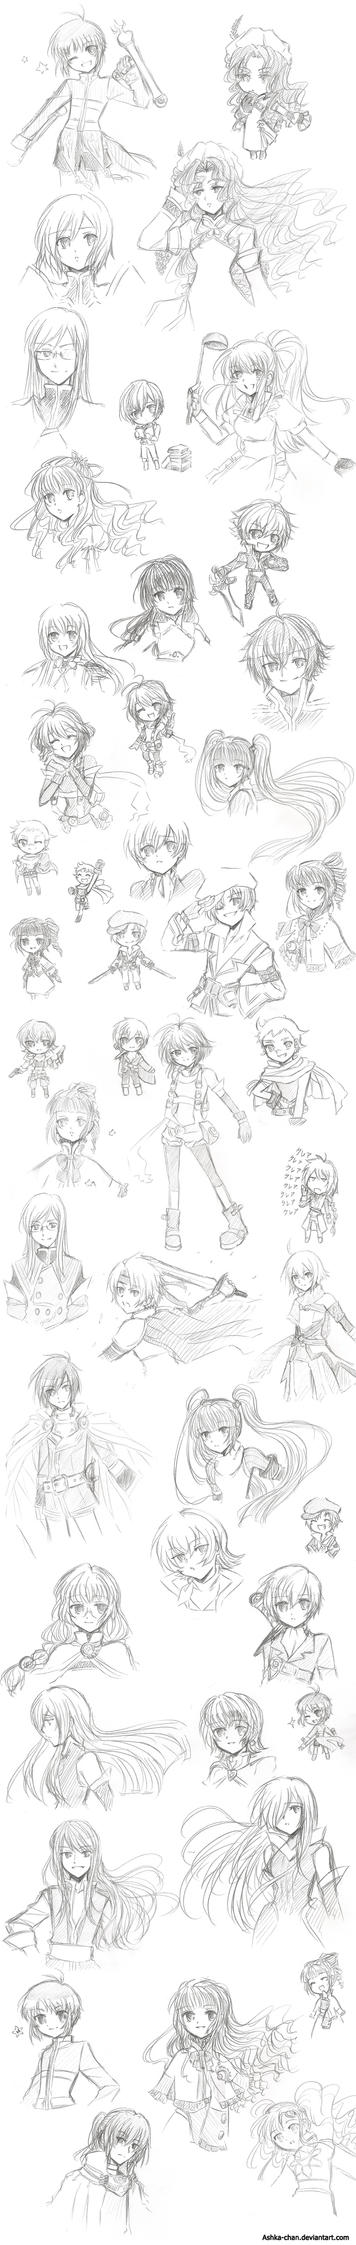 Tales of Sketches by Ashka-chan